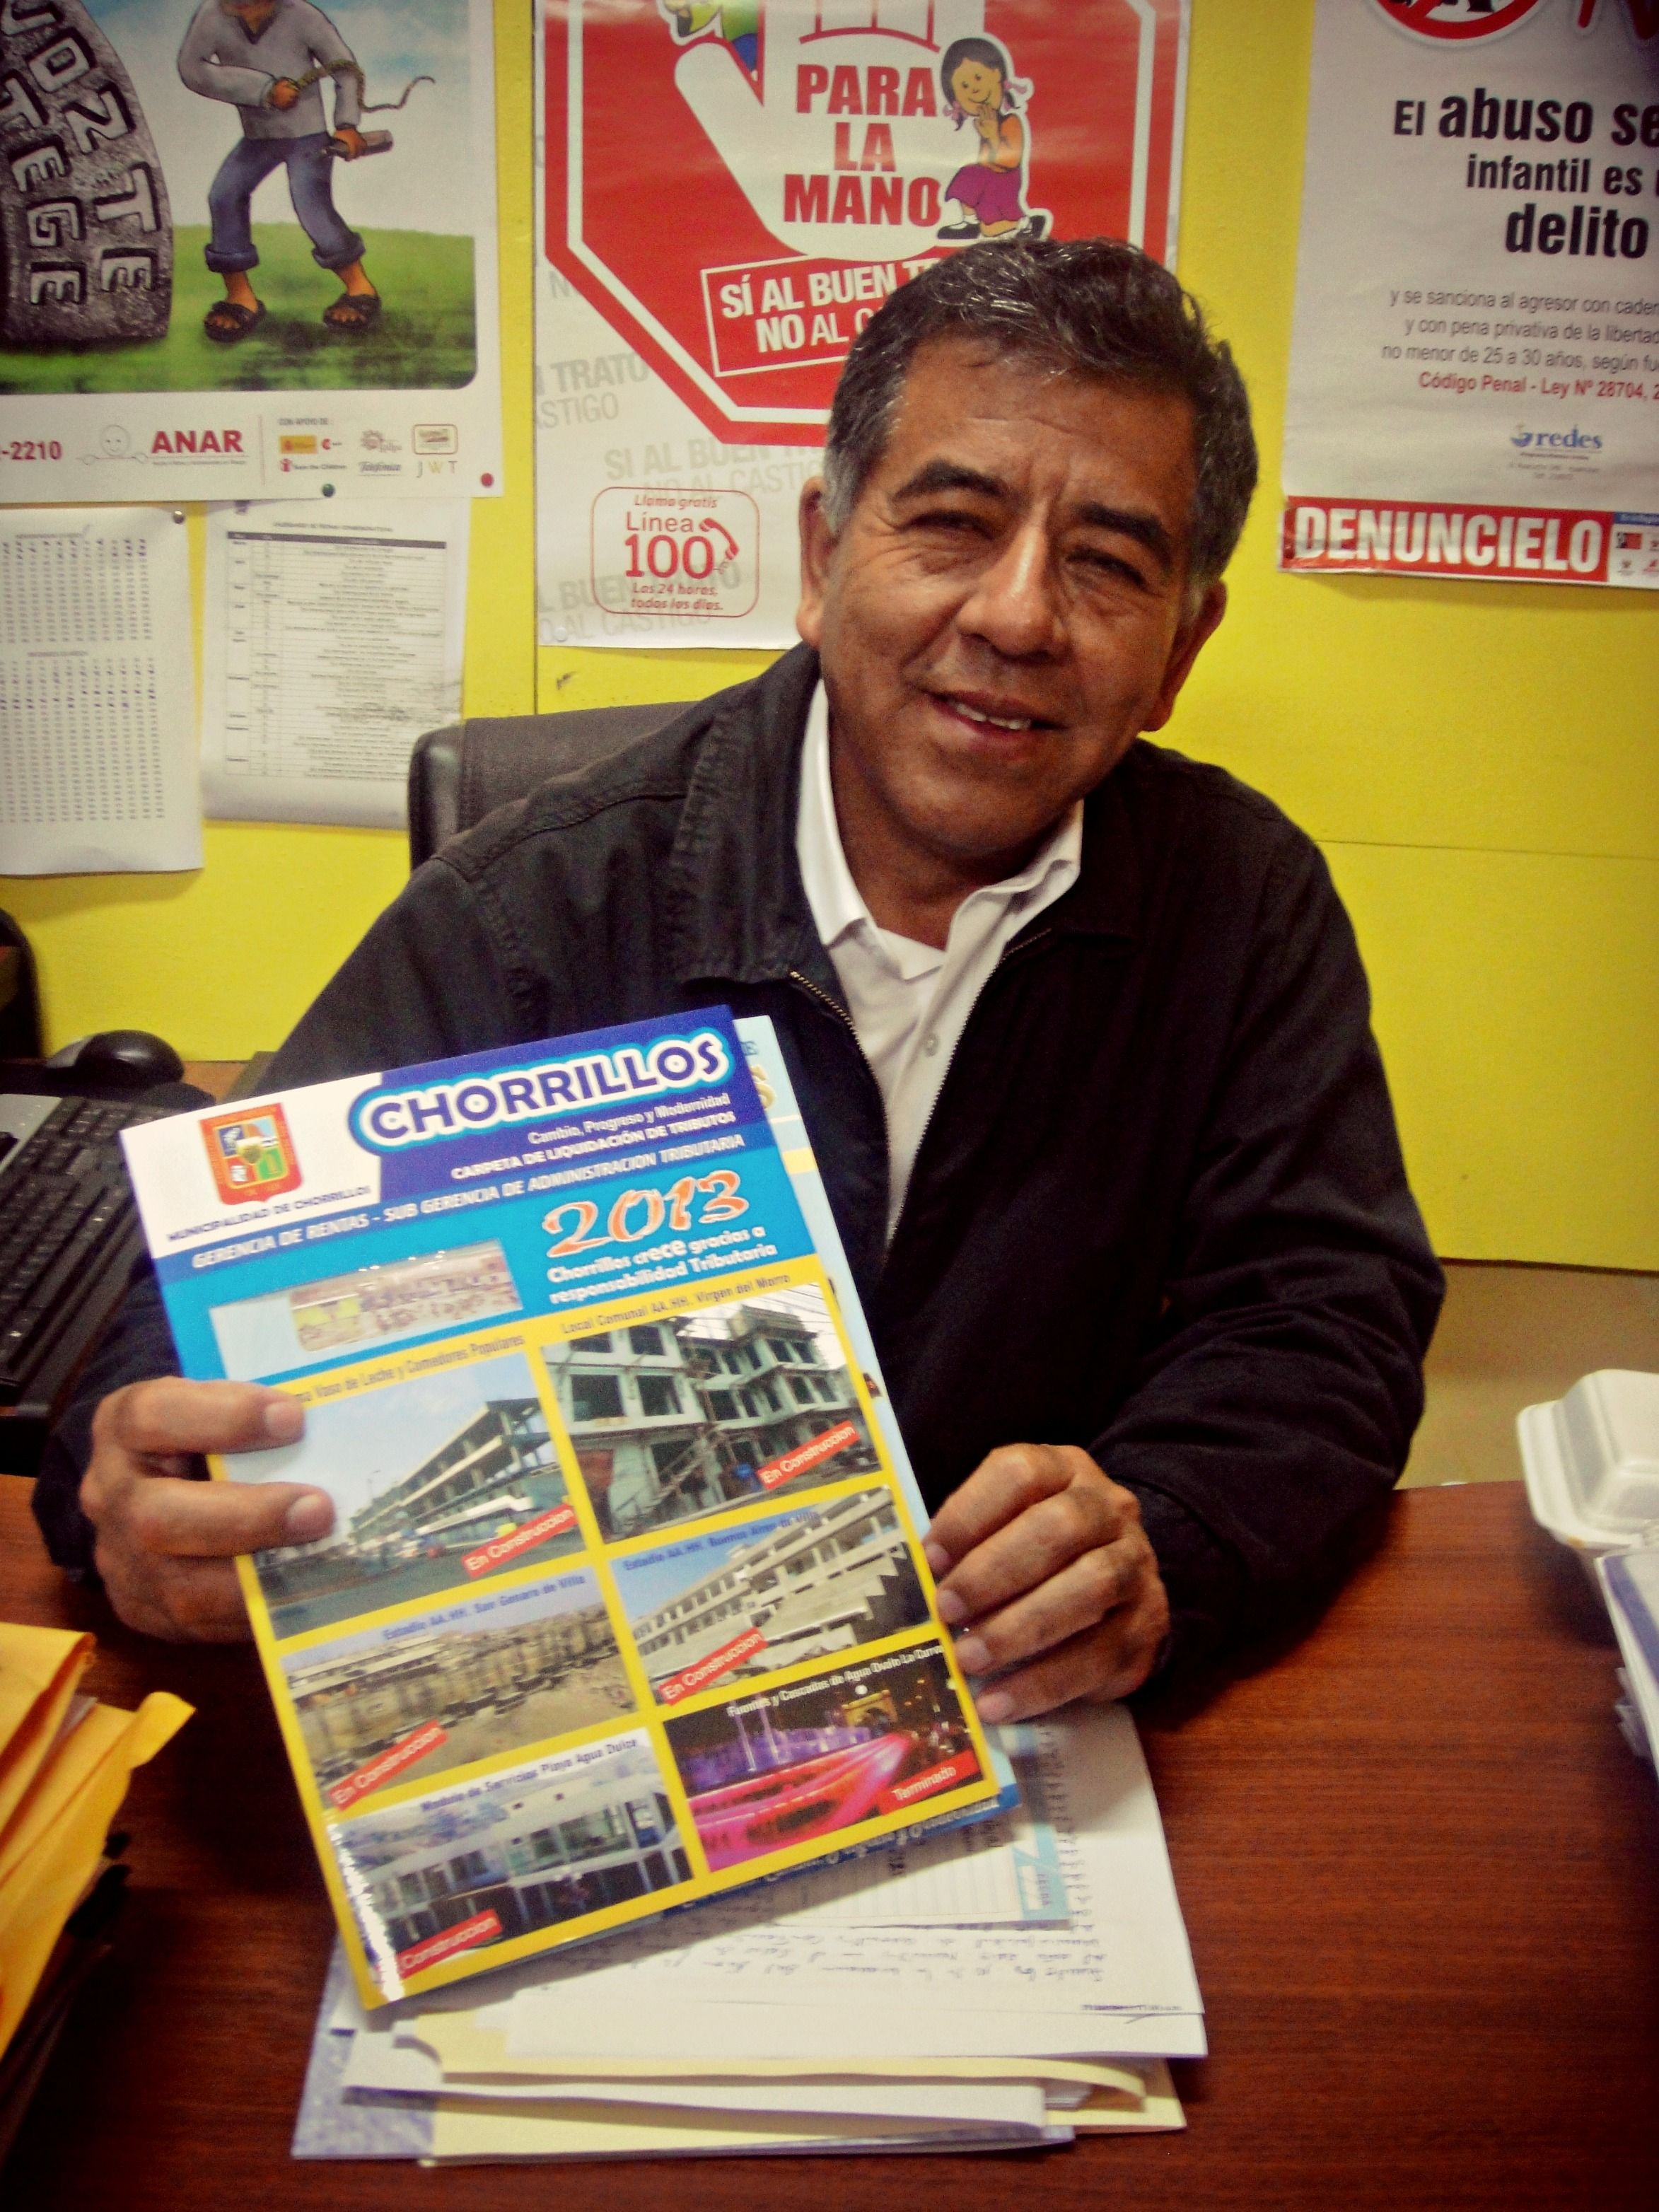 Entrevista al Sr. Chuqui Solsol , representante de Imagen Institucional de la Municipalidad de Chorrillos.